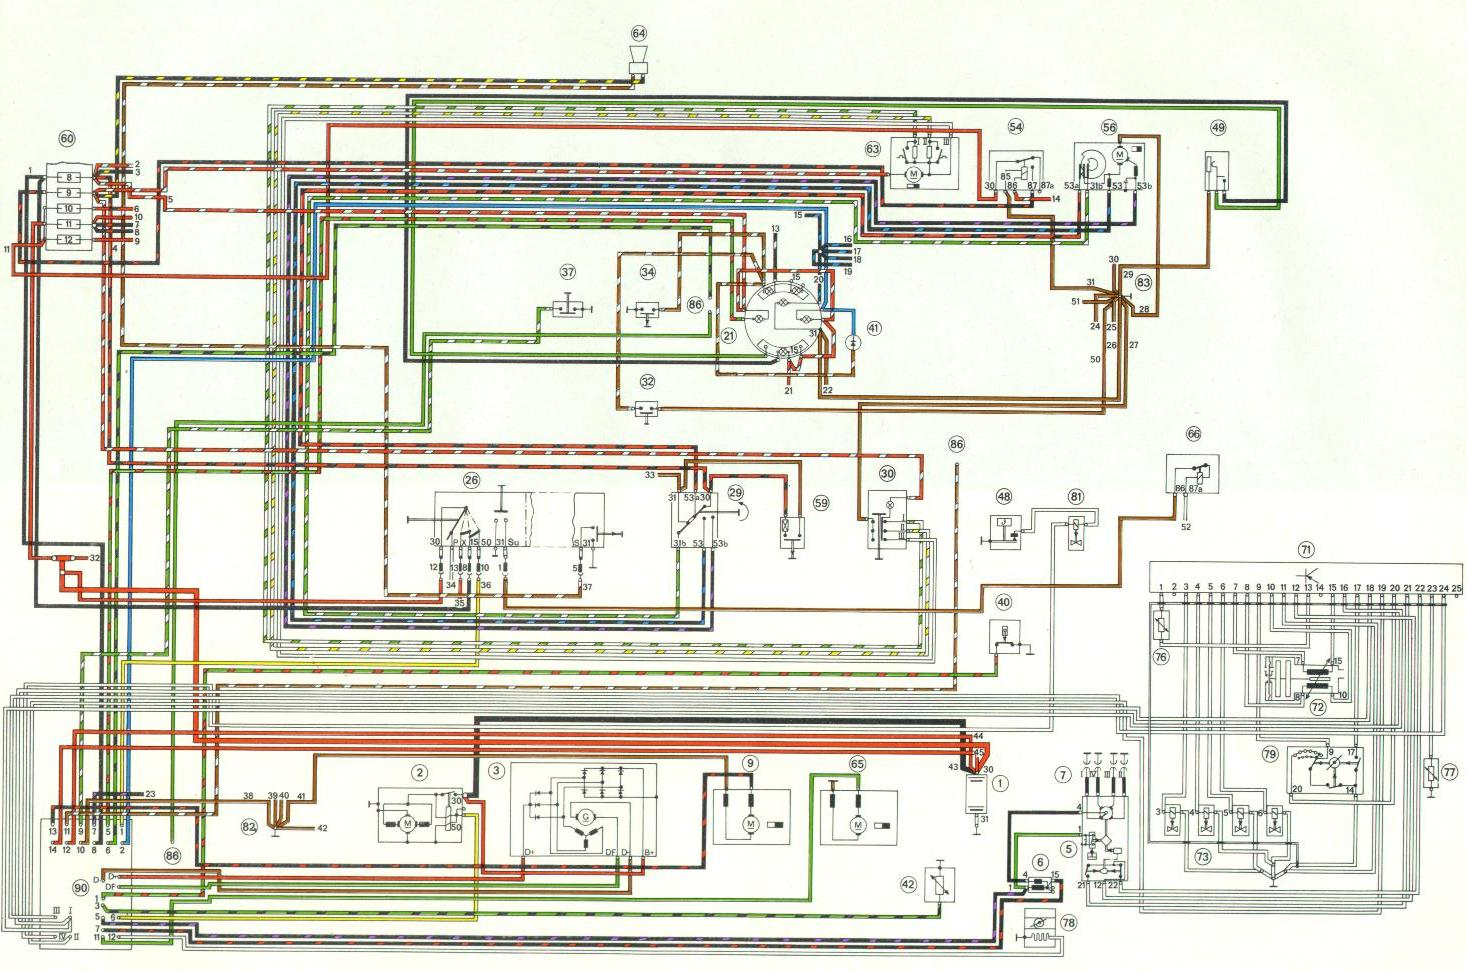 hight resolution of 1975 porsche 914 wiring diagram 31 wiring diagram images 1973 porsche 914 wiring diagram porsche 914 wiring diagrams